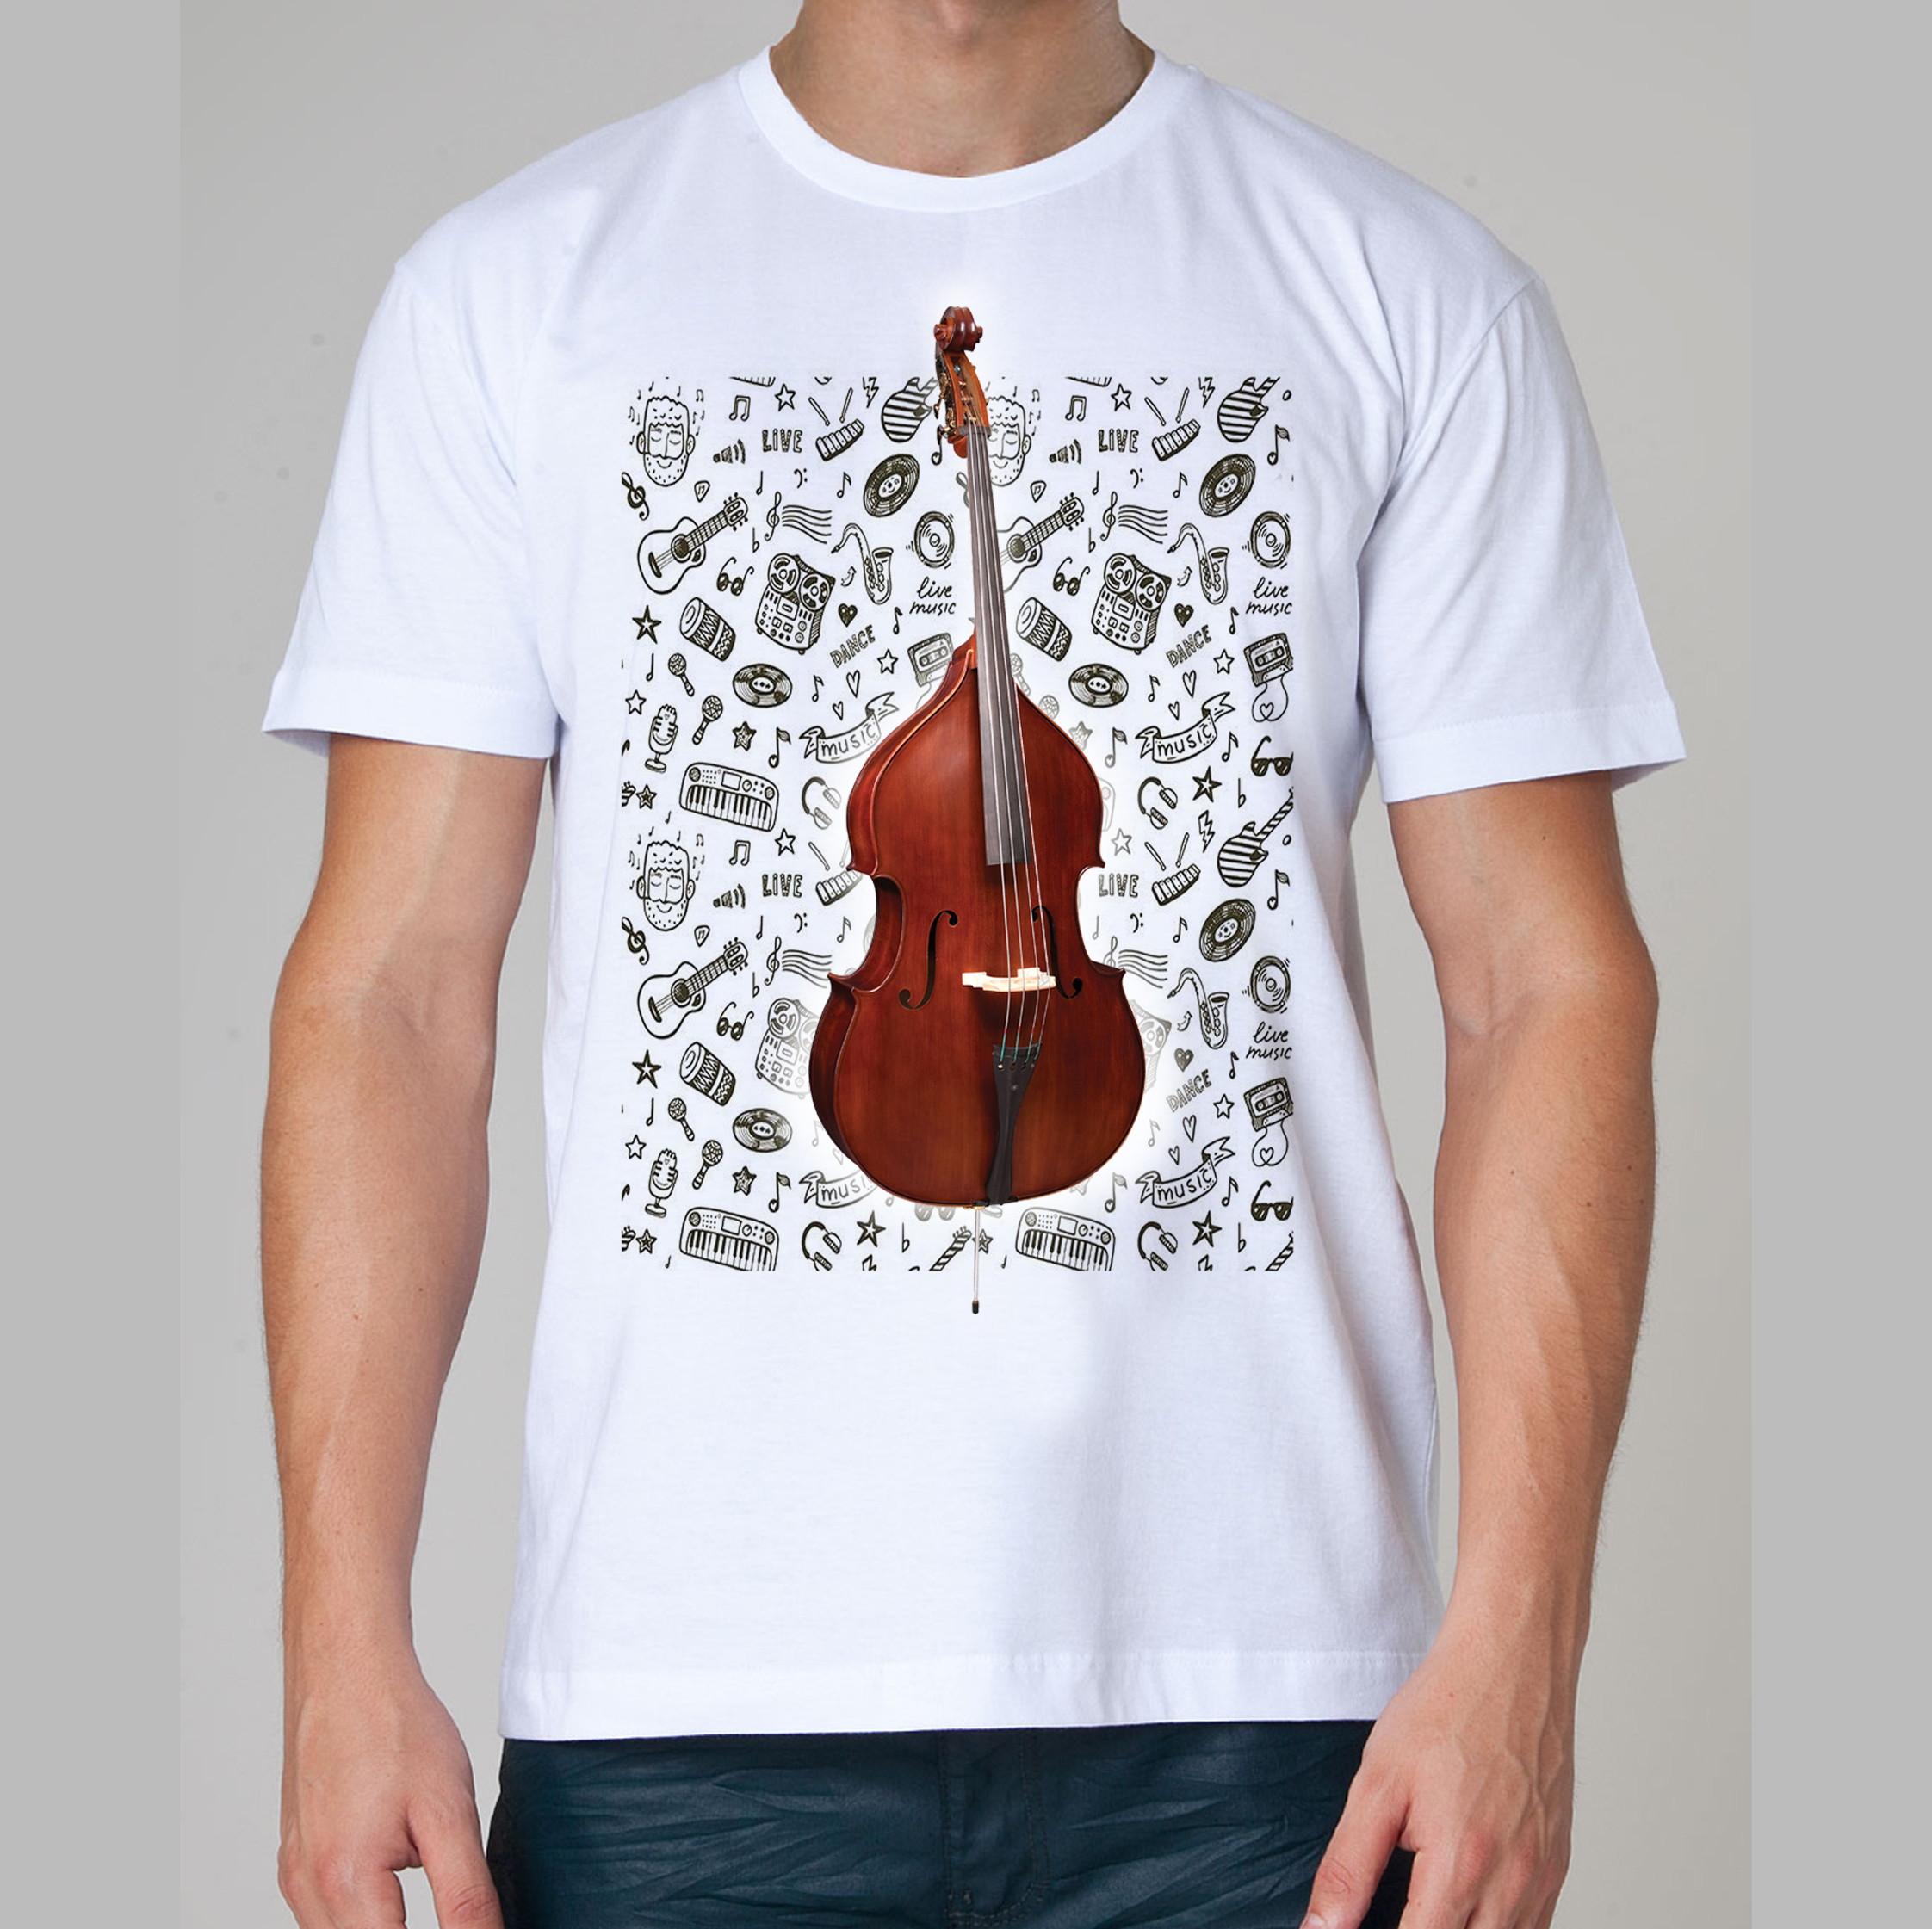 a4d7b7c102 Camiseta Rock Baixo Jazz